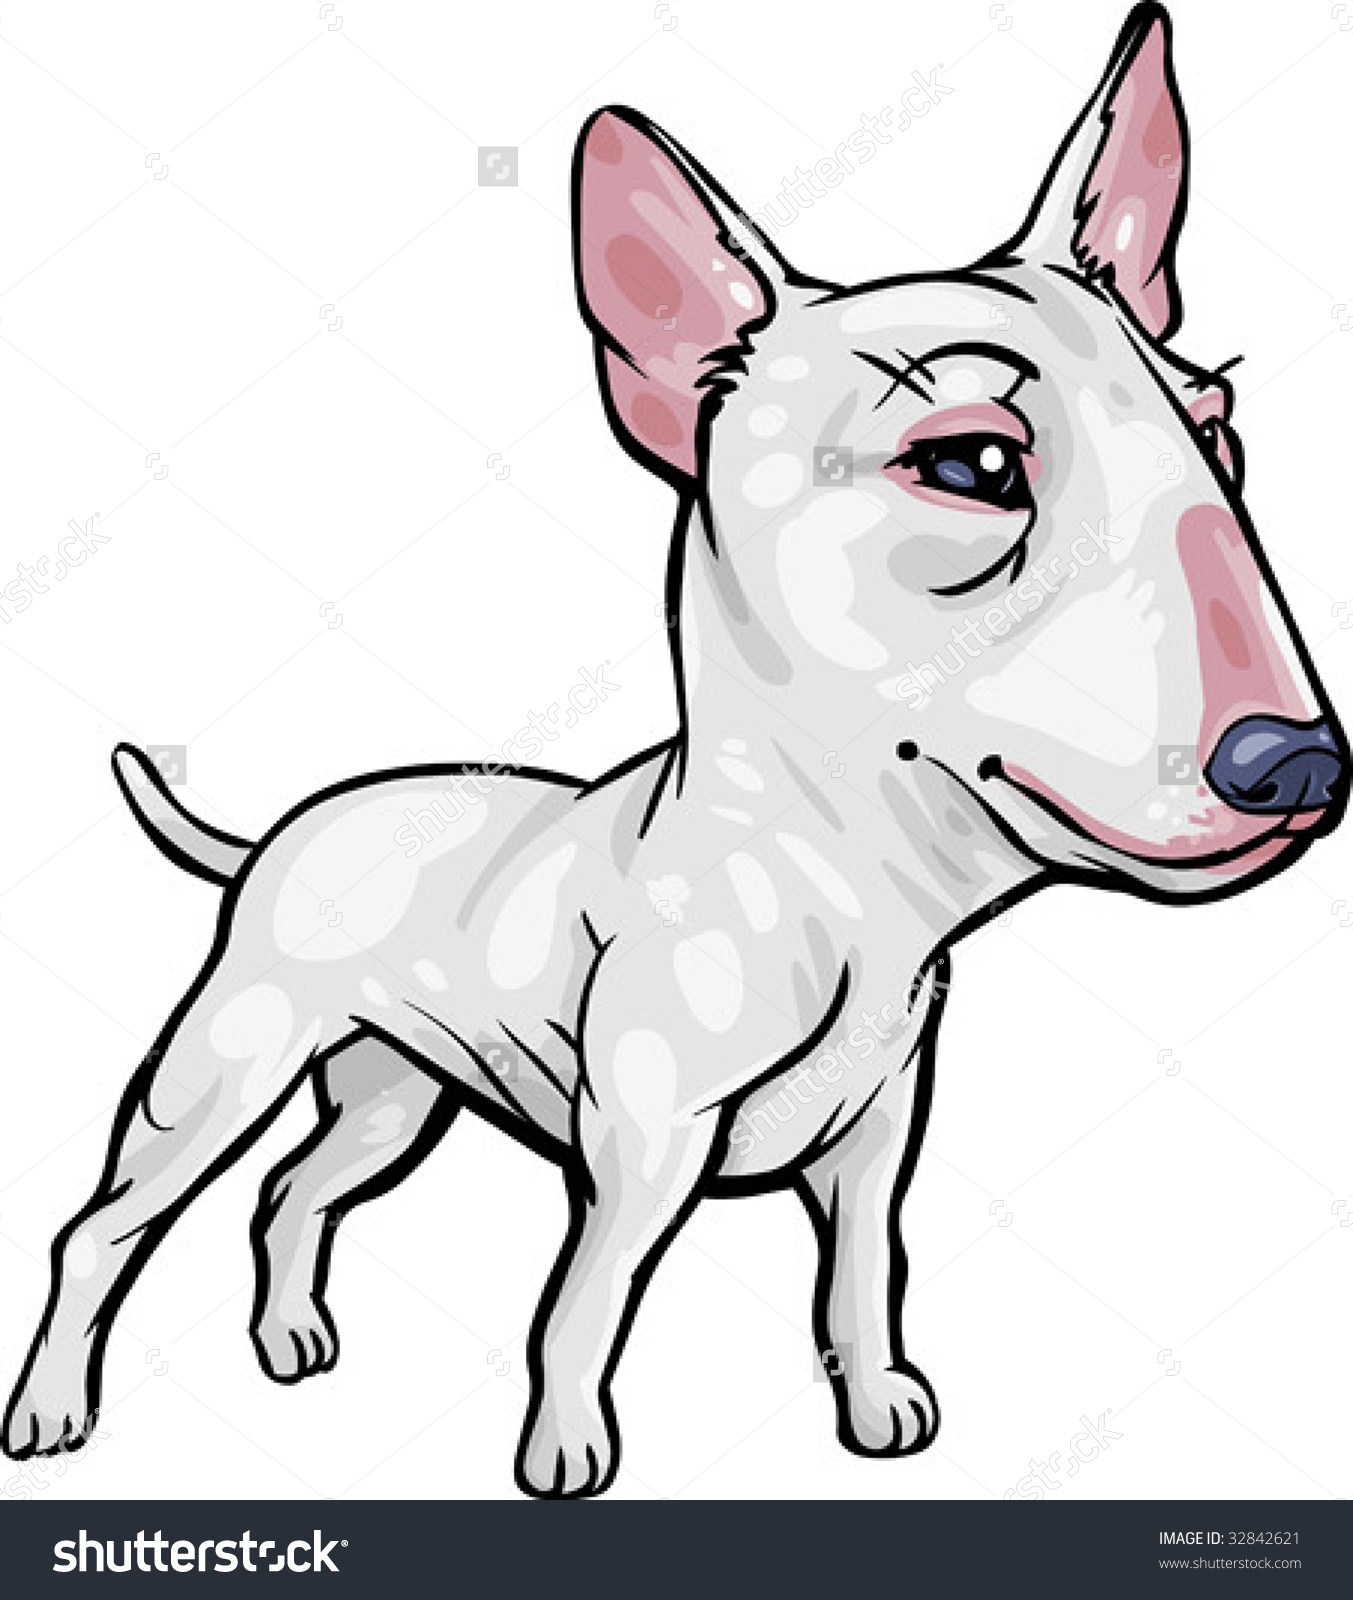 Vector, Clip Art, Caricature Illustration Of Bull Terrier Dog.